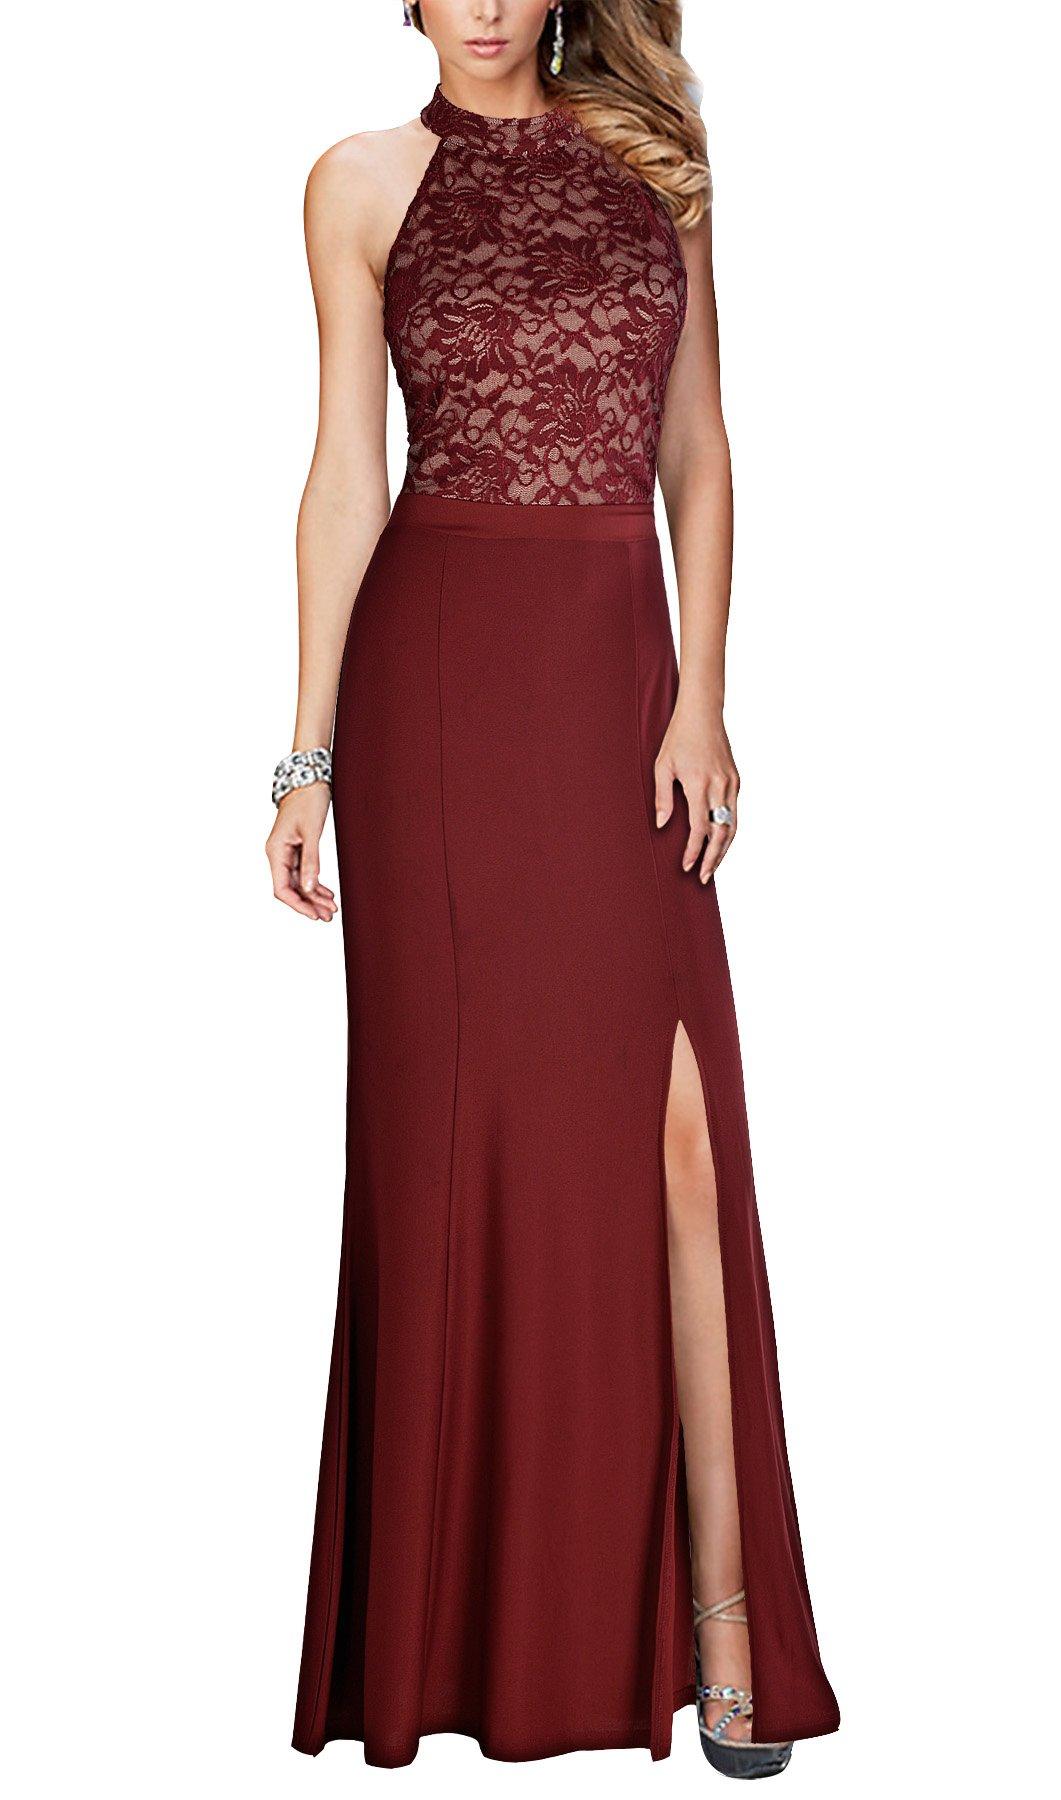 REPHYLLIS Women's Halter Floral Lace Vintage Wedding Maxi Long Dress(XL,Burgundy)